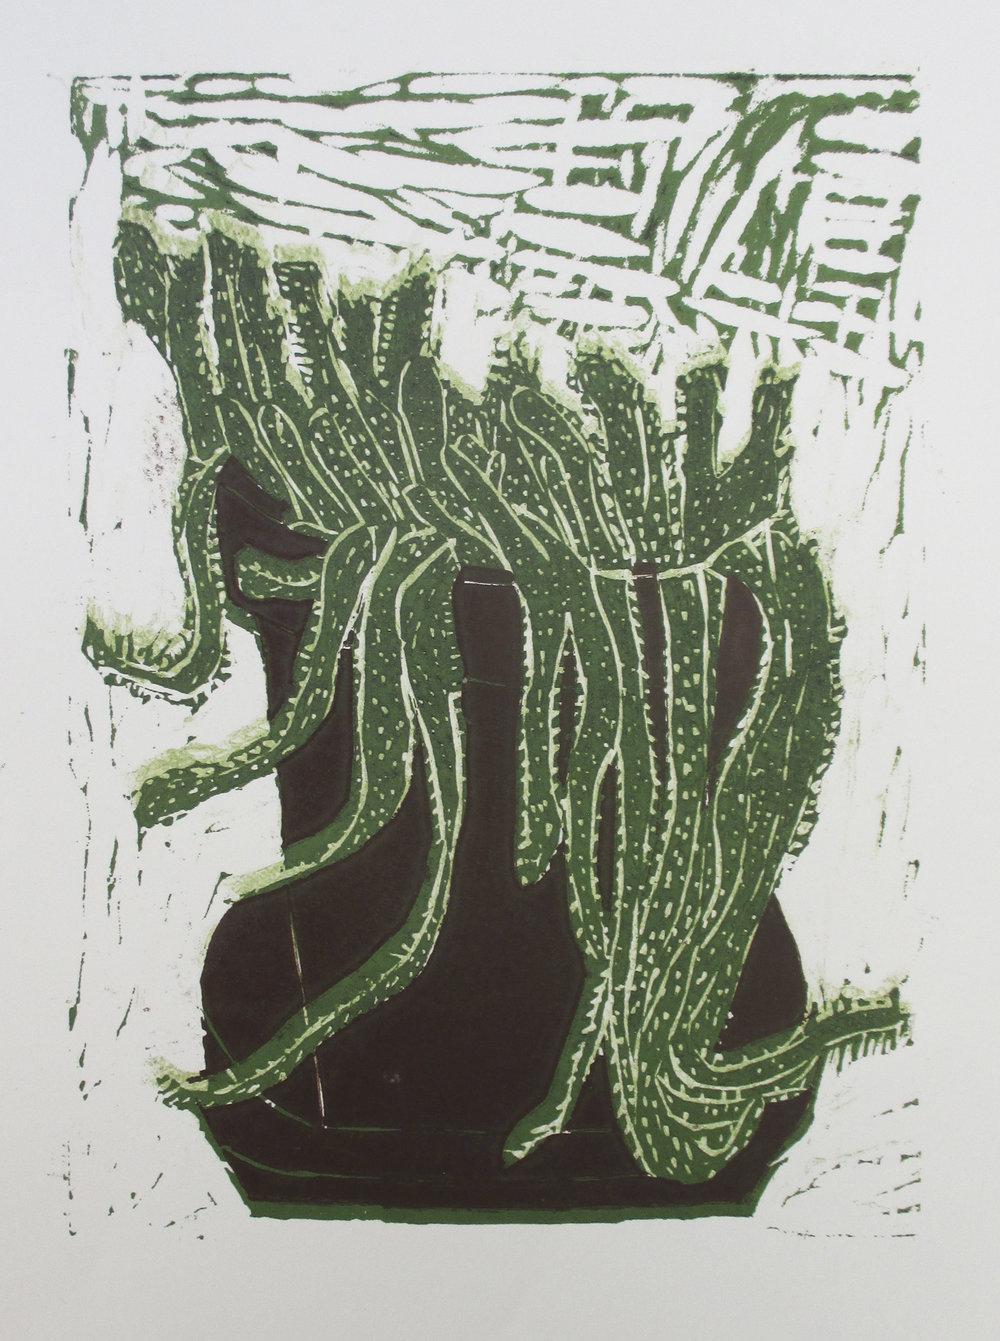 Christmas Cactus   Lino Print on Acid free Ken Cartridge 190gsm  29.7 cm x 42 cm  Edition of 20  2013